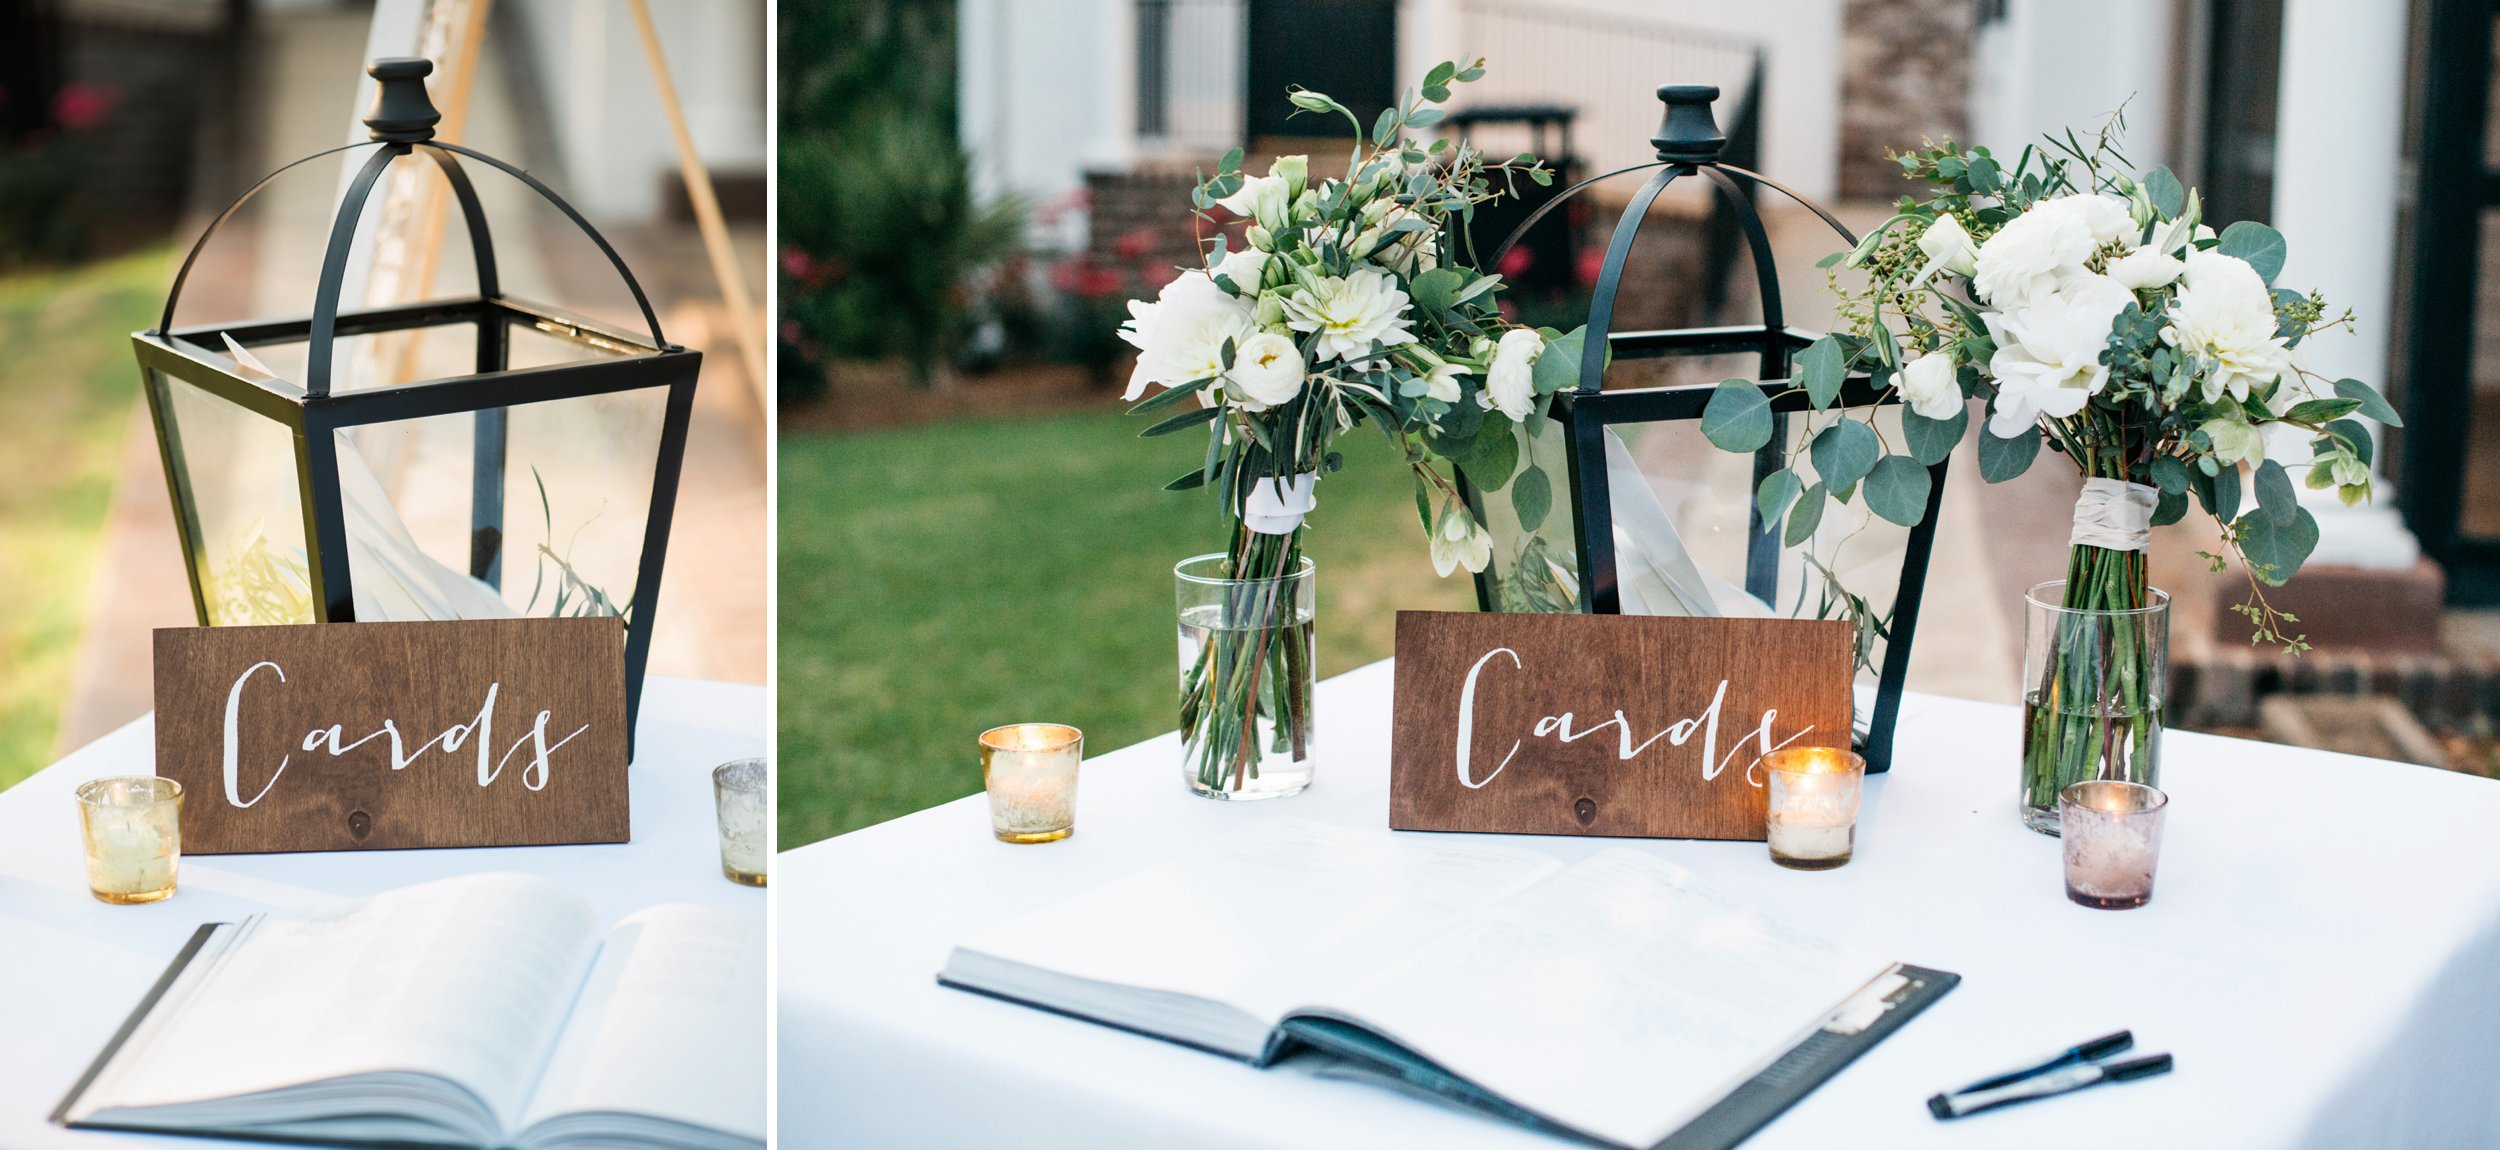 legare-waring-house-wedding-62.jpg